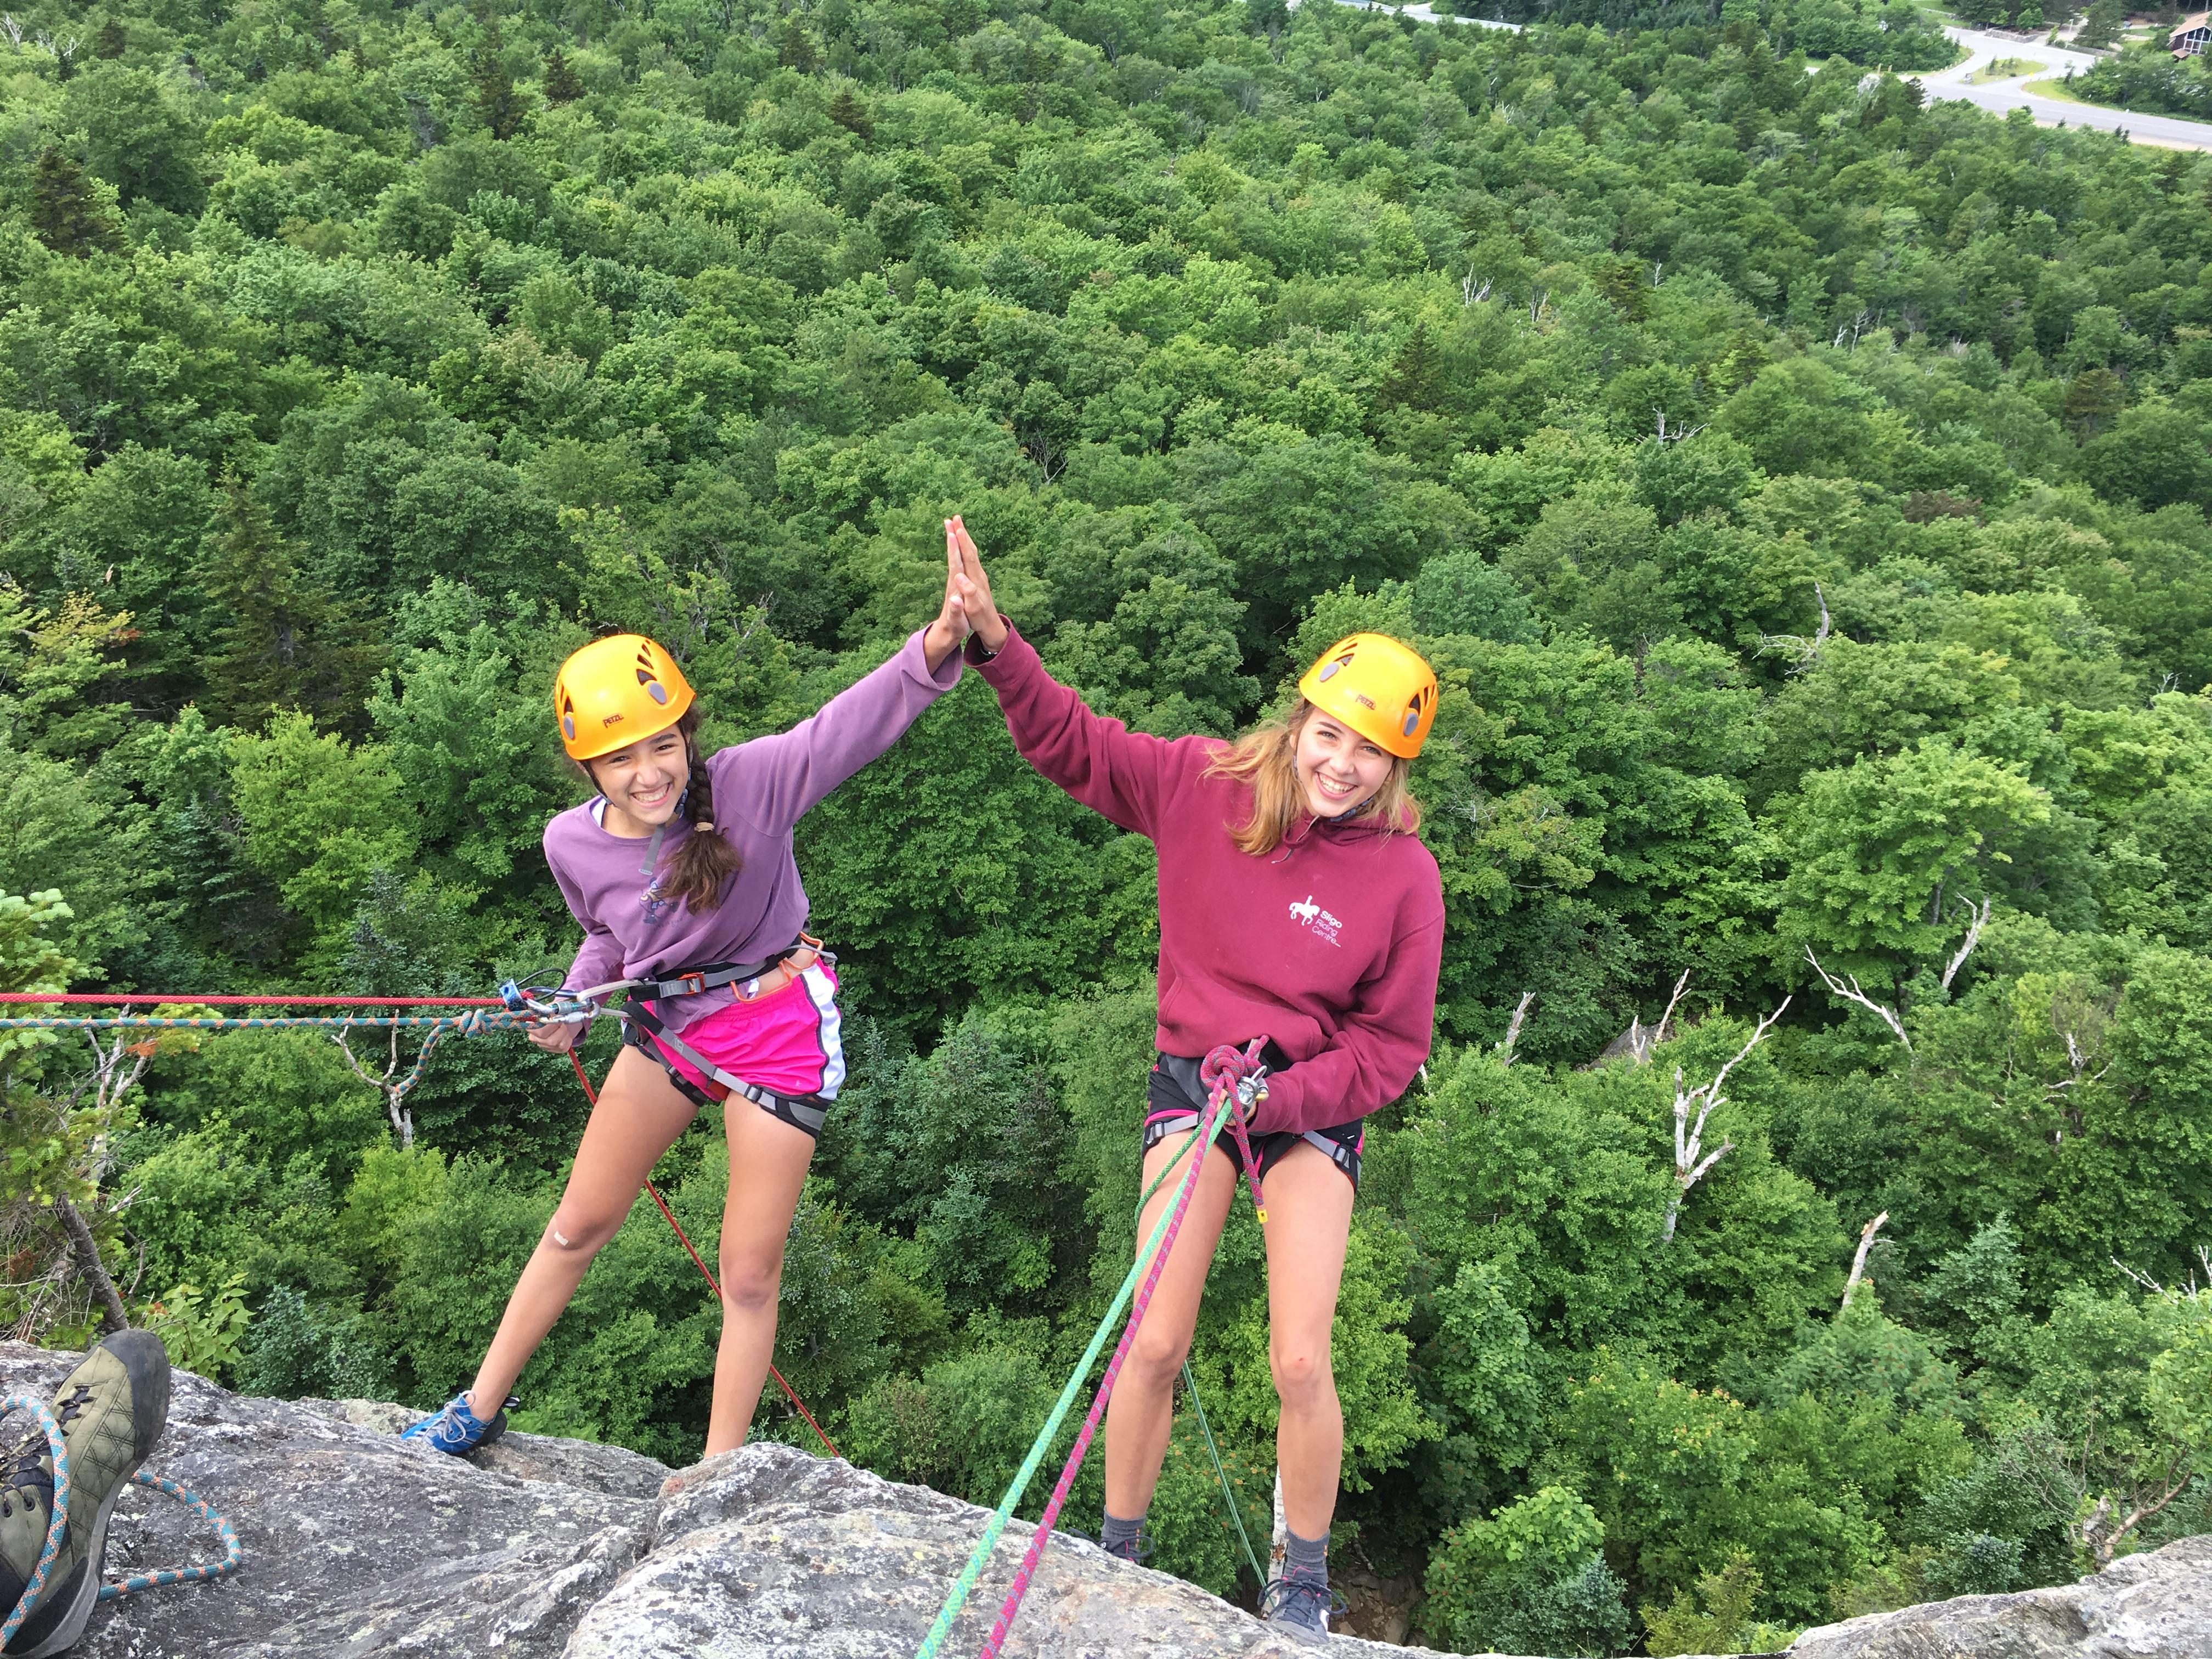 Summer Program - Rock Climbing   AMC's Teen Wilderness Adventures: 7-Day Rocks & Rivers Adventure (Ages 15-18)